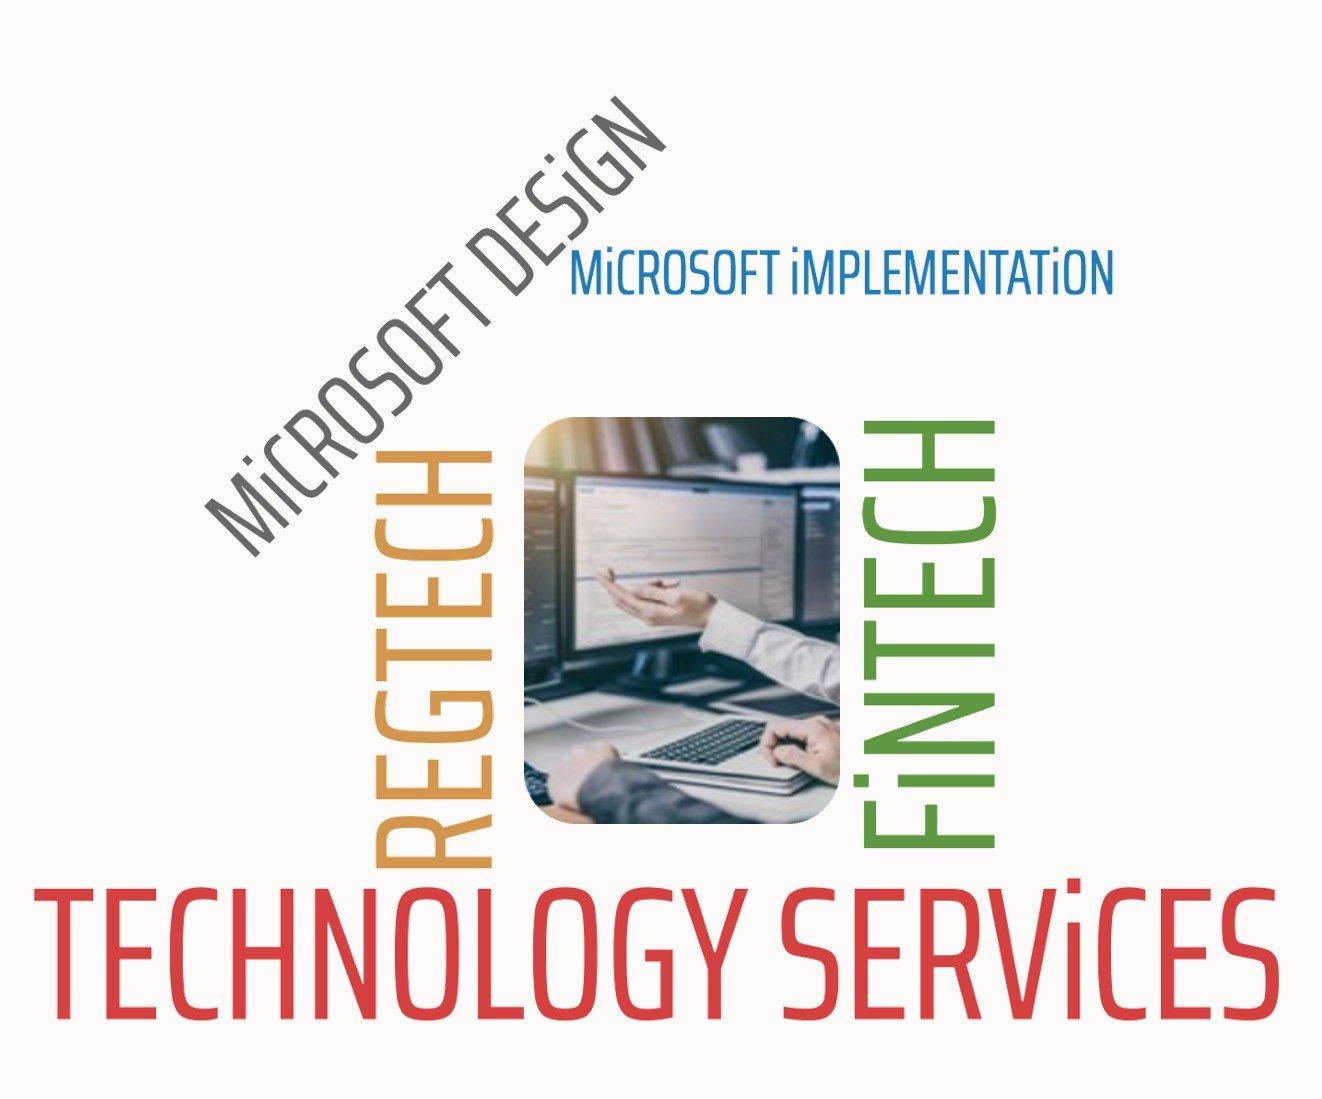 WordCloud_TechnologyServices